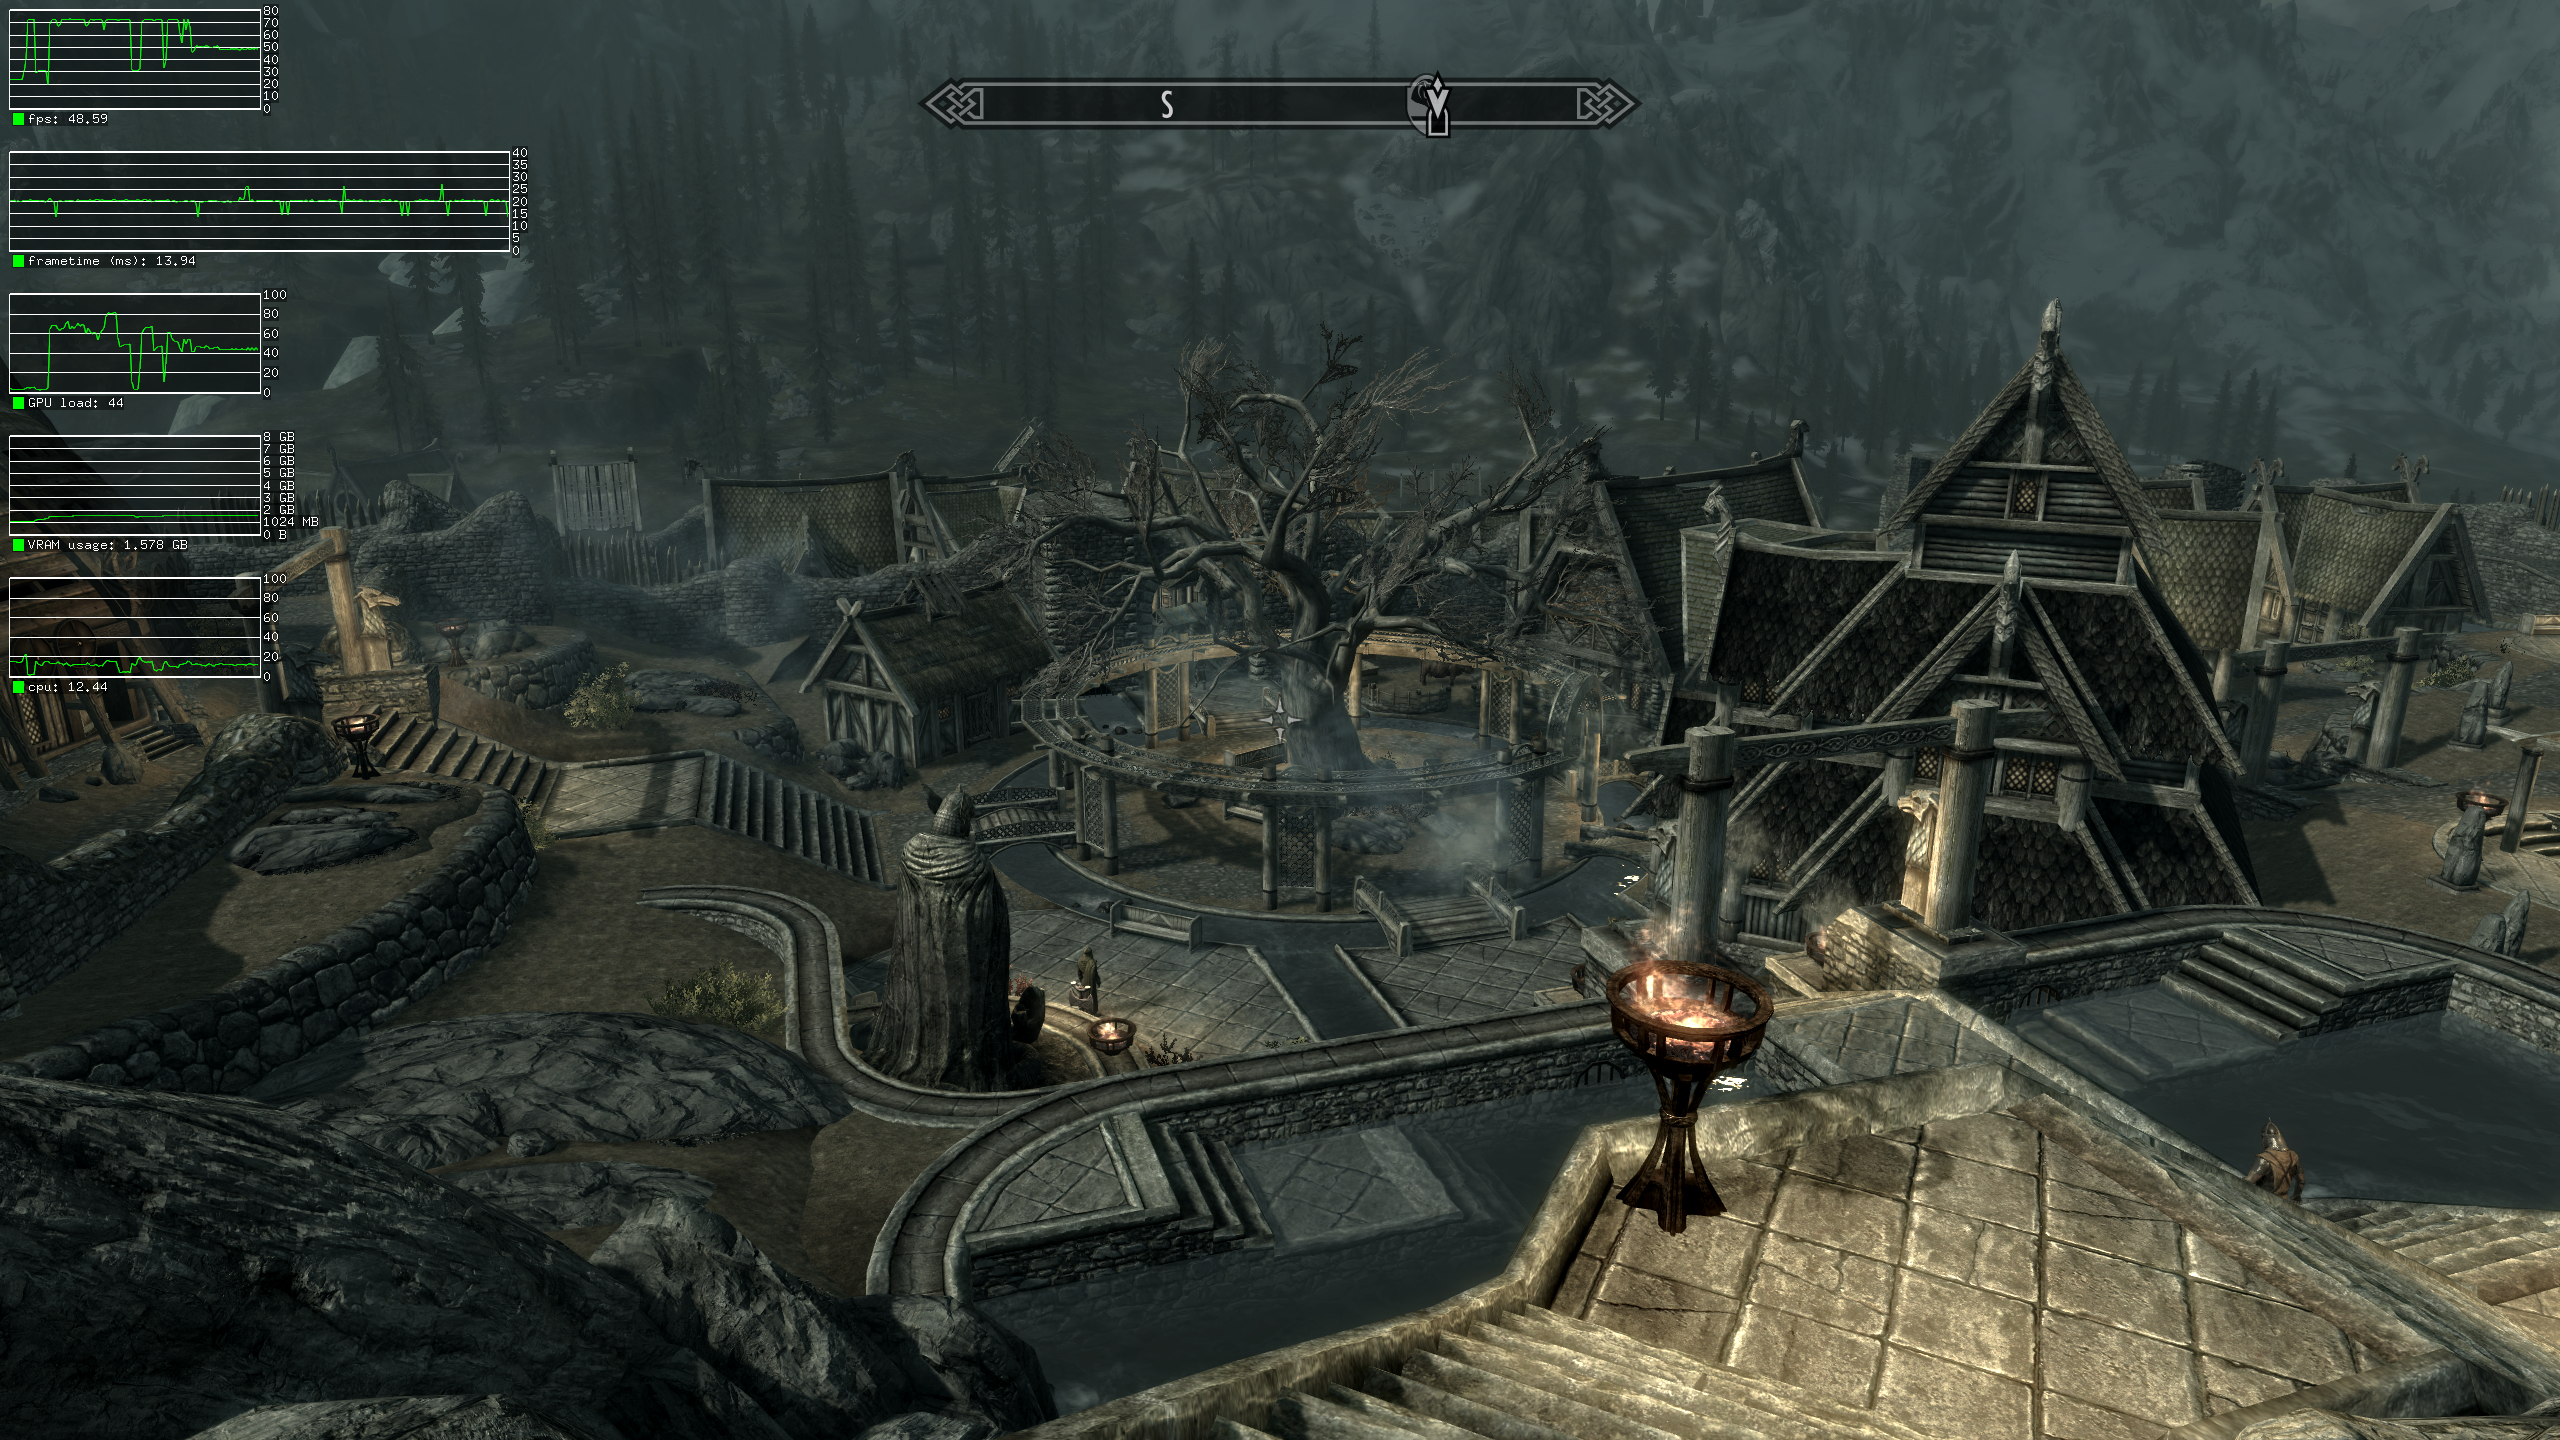 Skyrim: triple buffering doesn't seem to be working